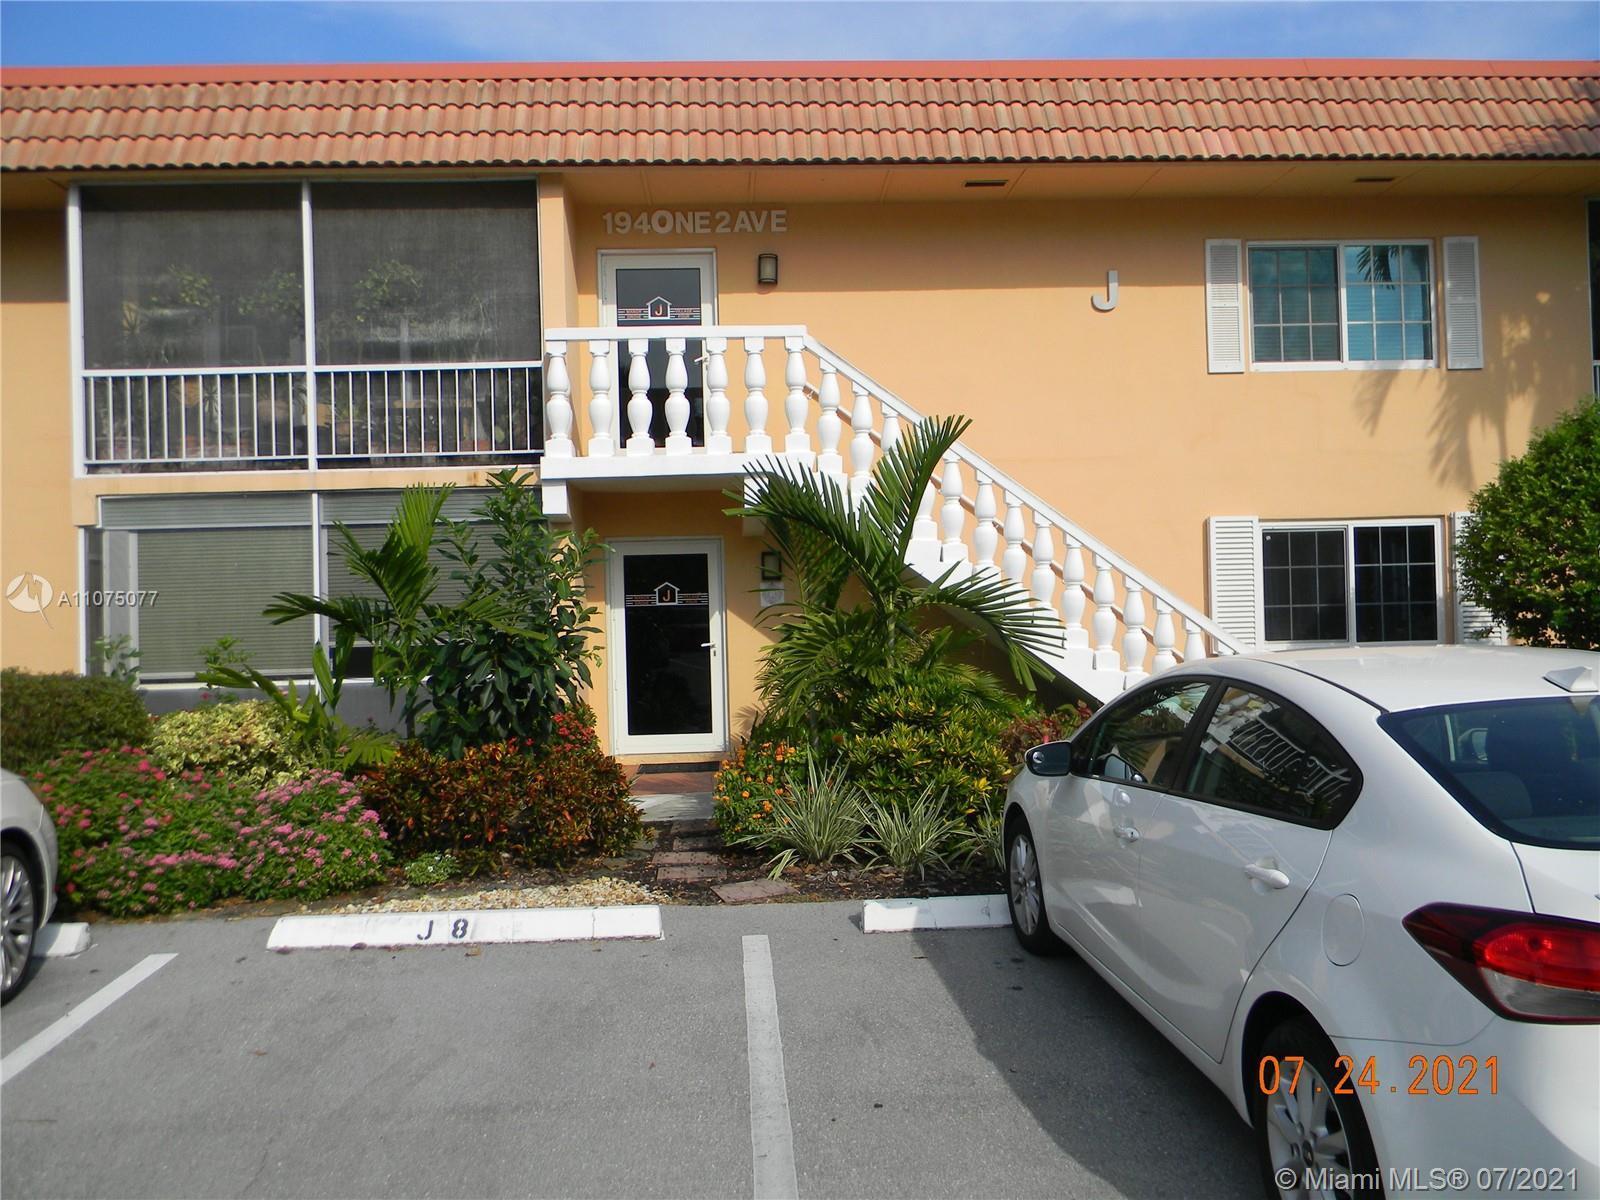 Wilton Manors 2 bedroom 2 bath Condo in Manor Grove. First Floor unit. The kitchen has been updated